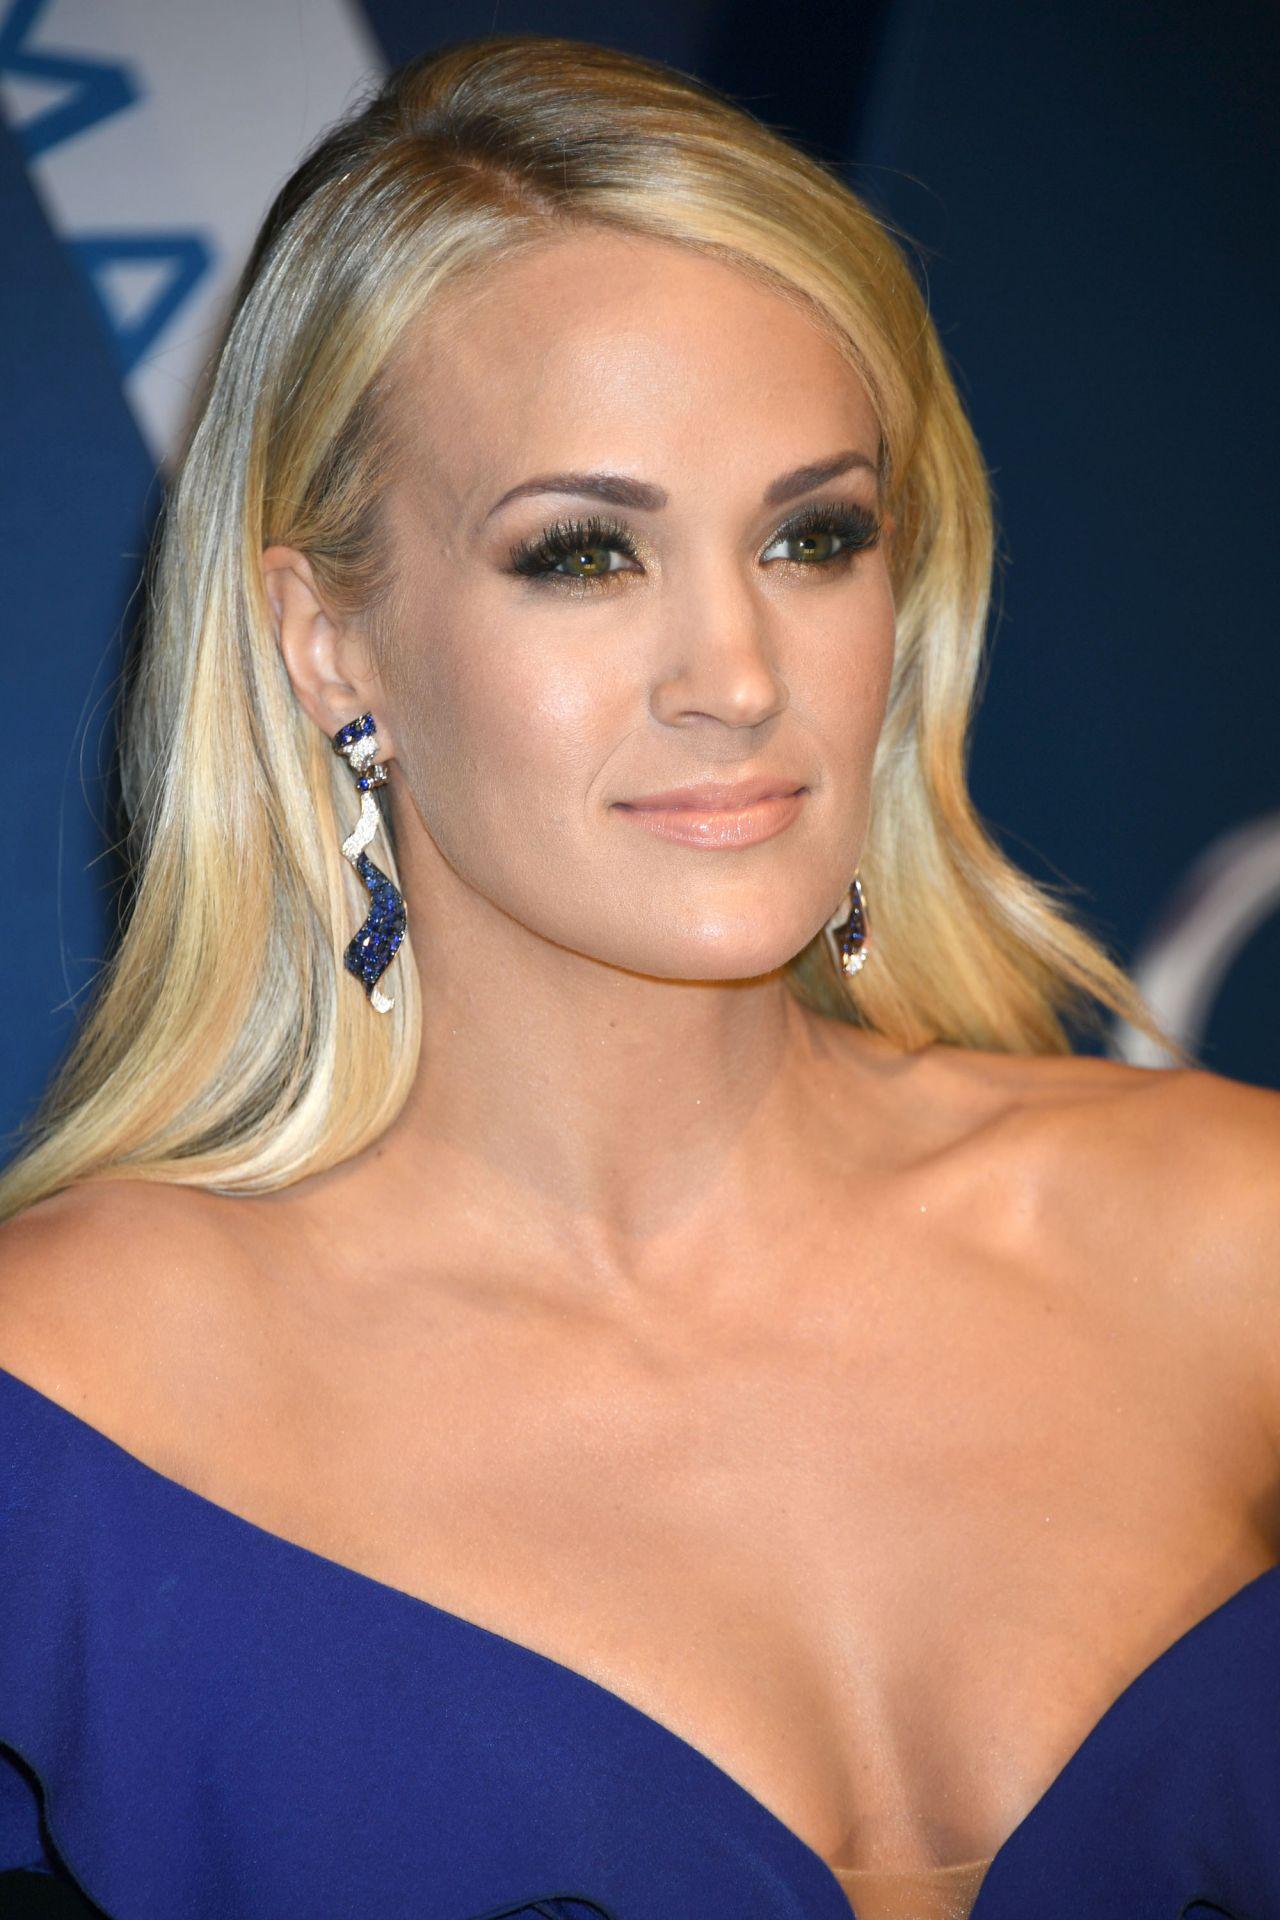 Carrie Underwood Cma Awards 2017 In Nashville